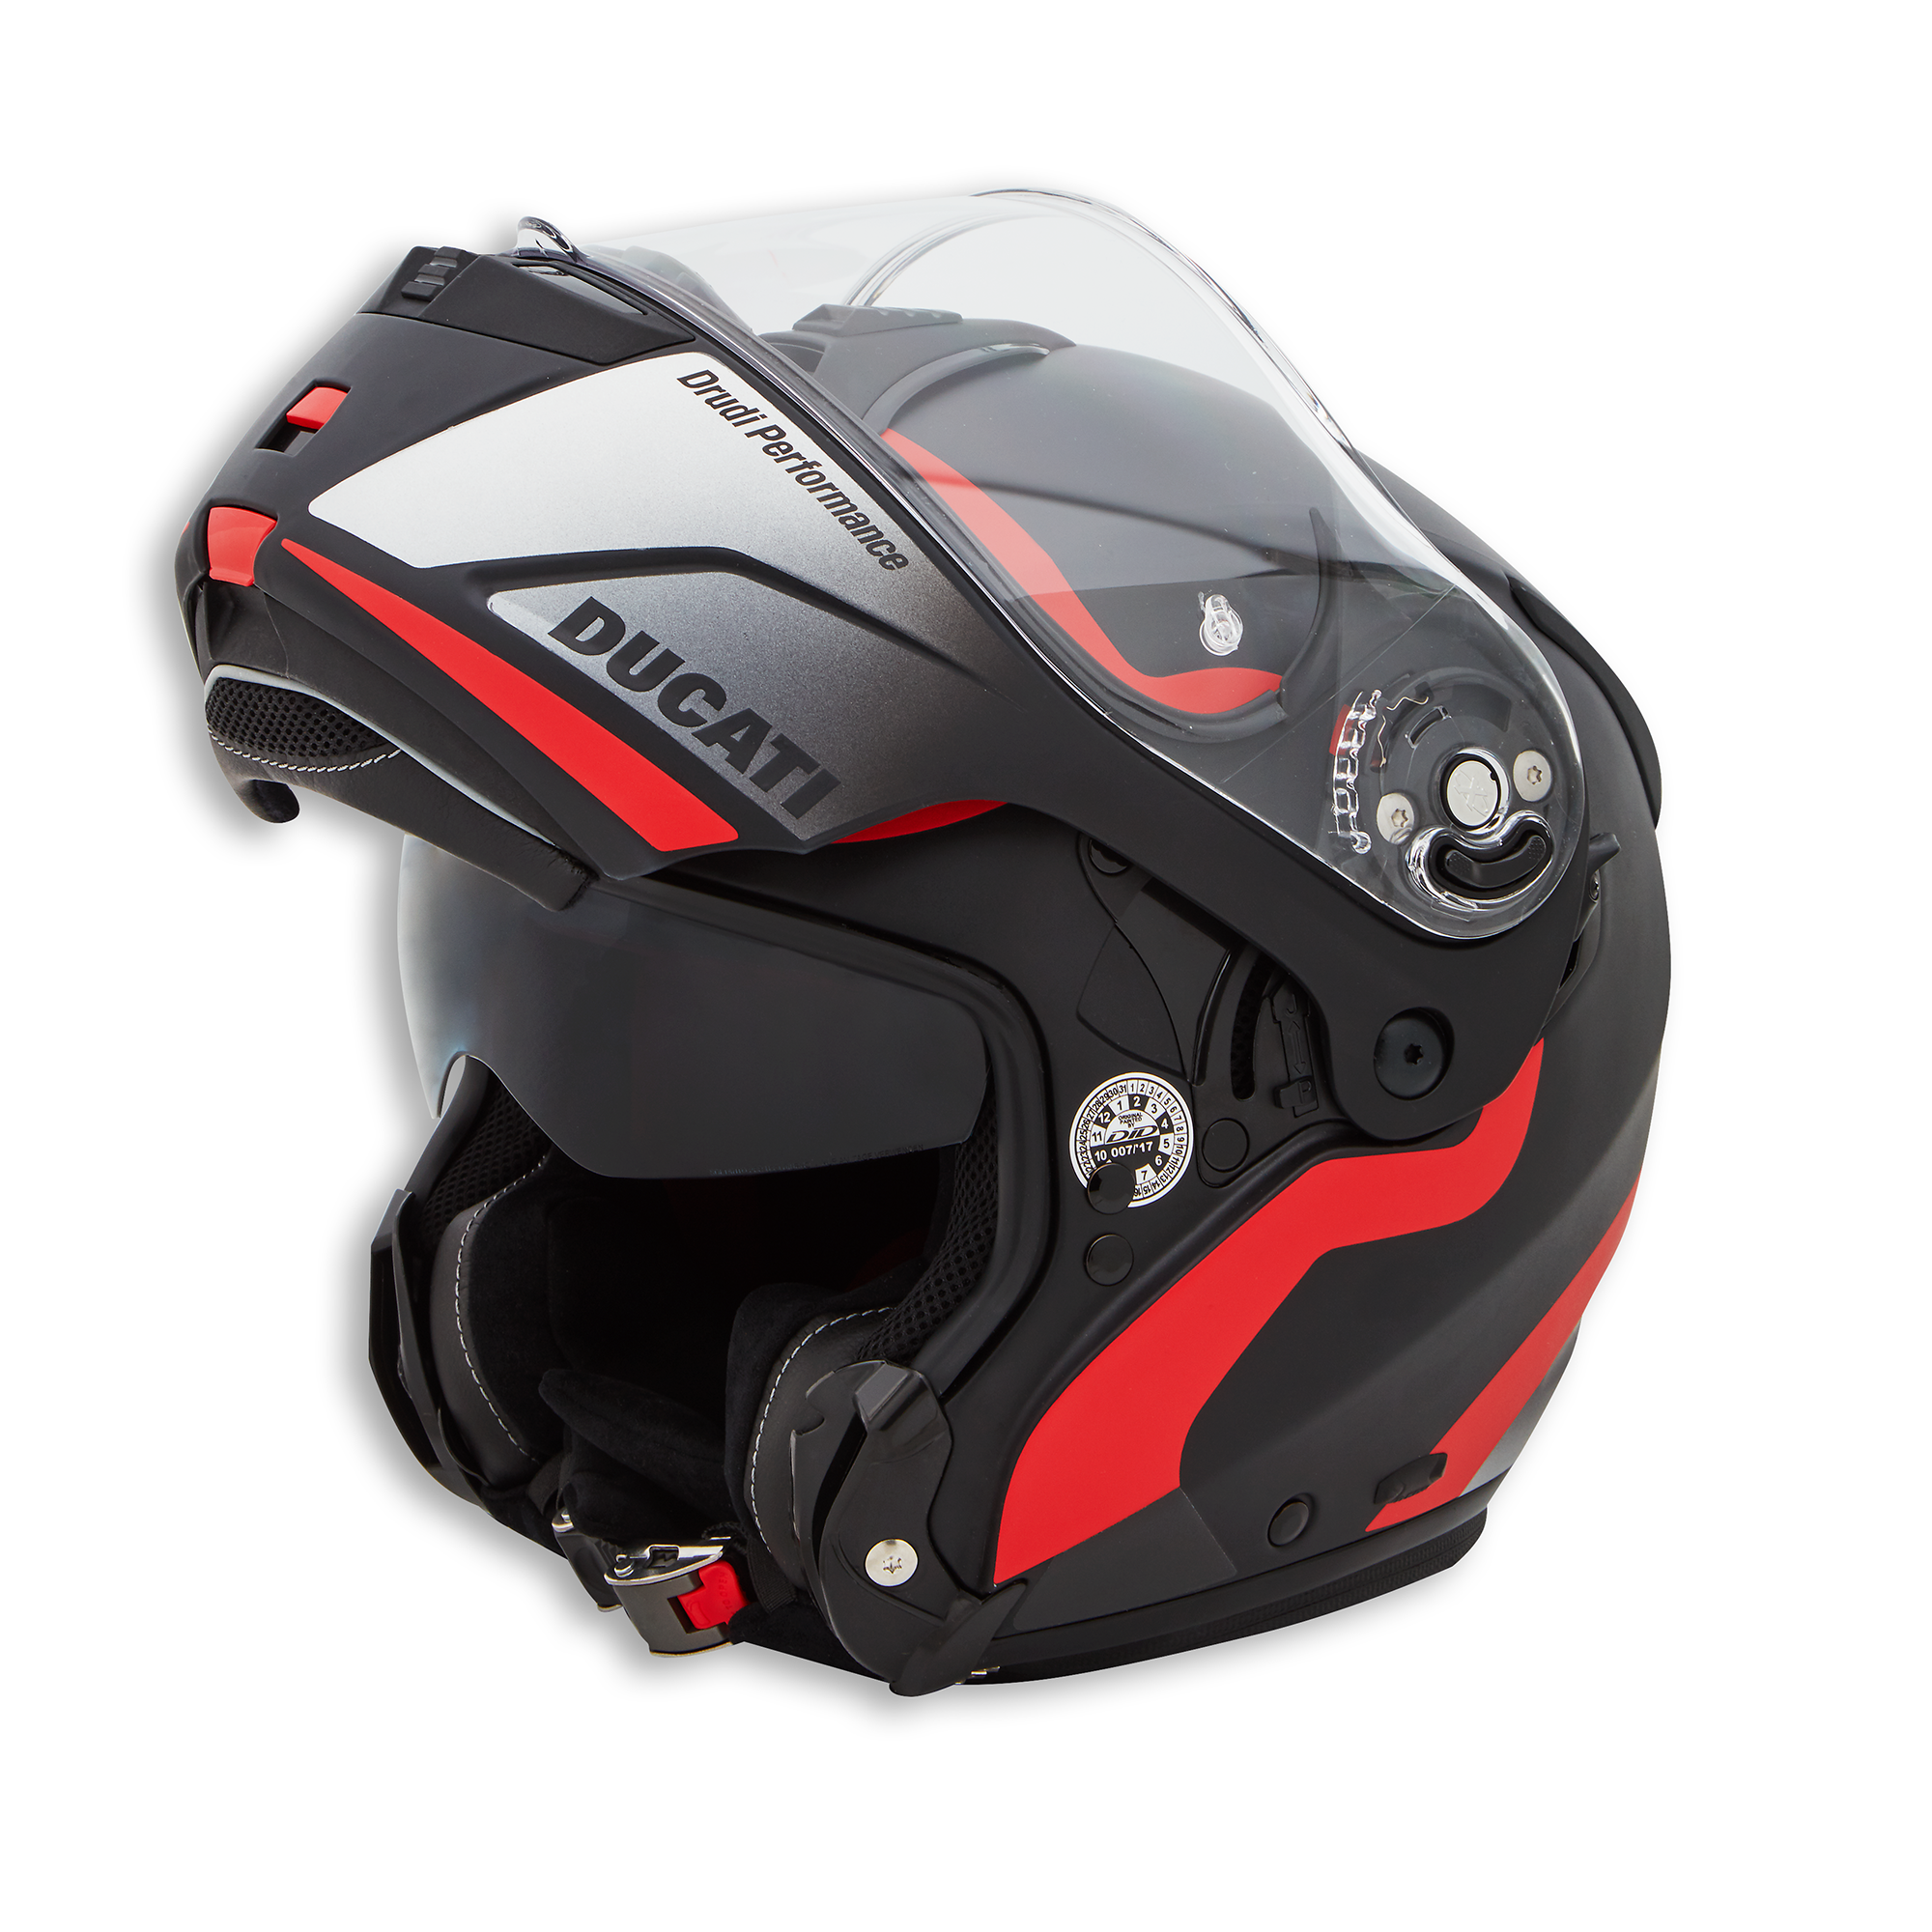 Ducati Horizon Modular helmet 981042002